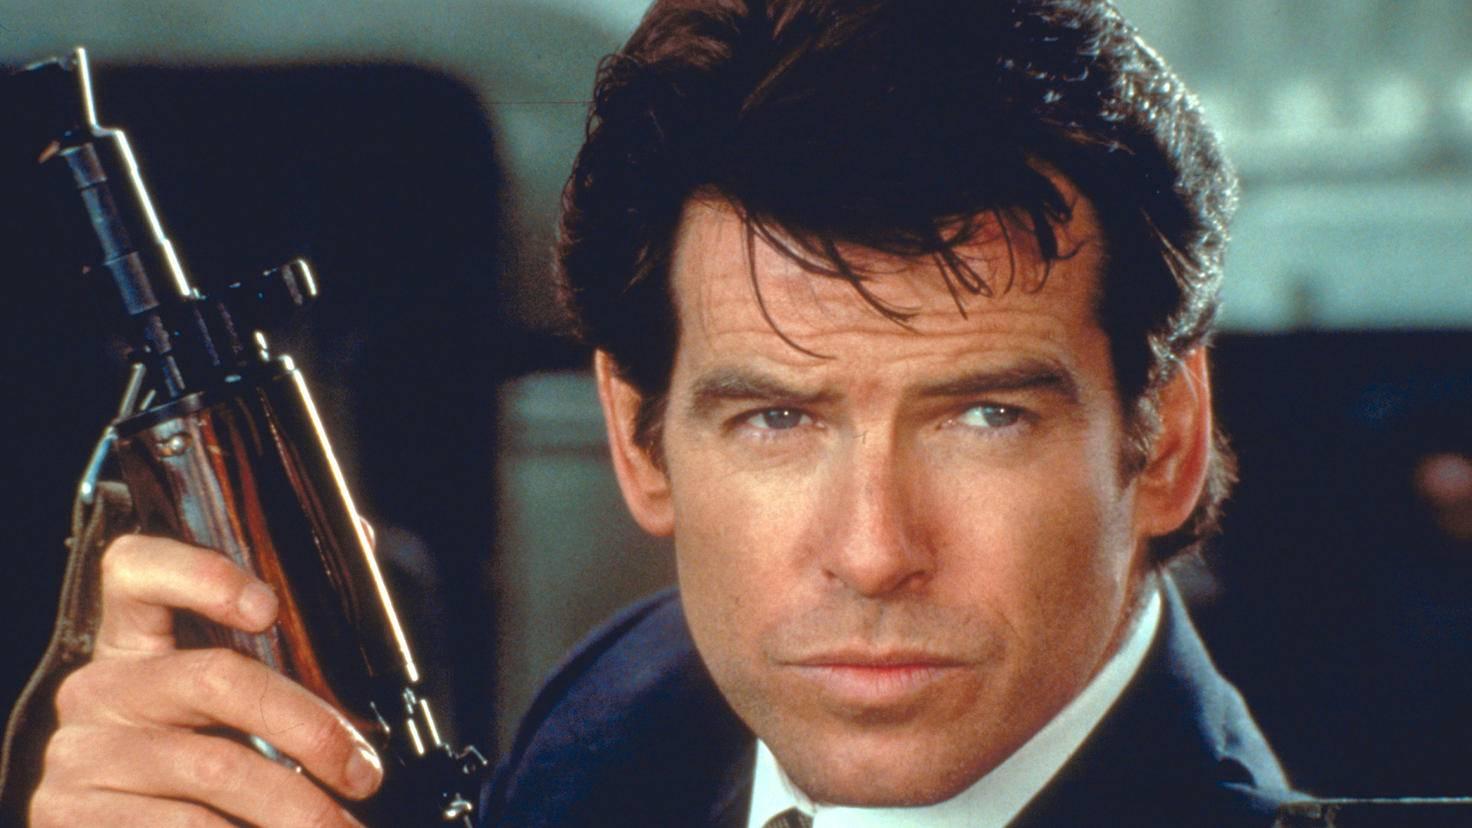 James Bond GoldenEye pierce brosnan